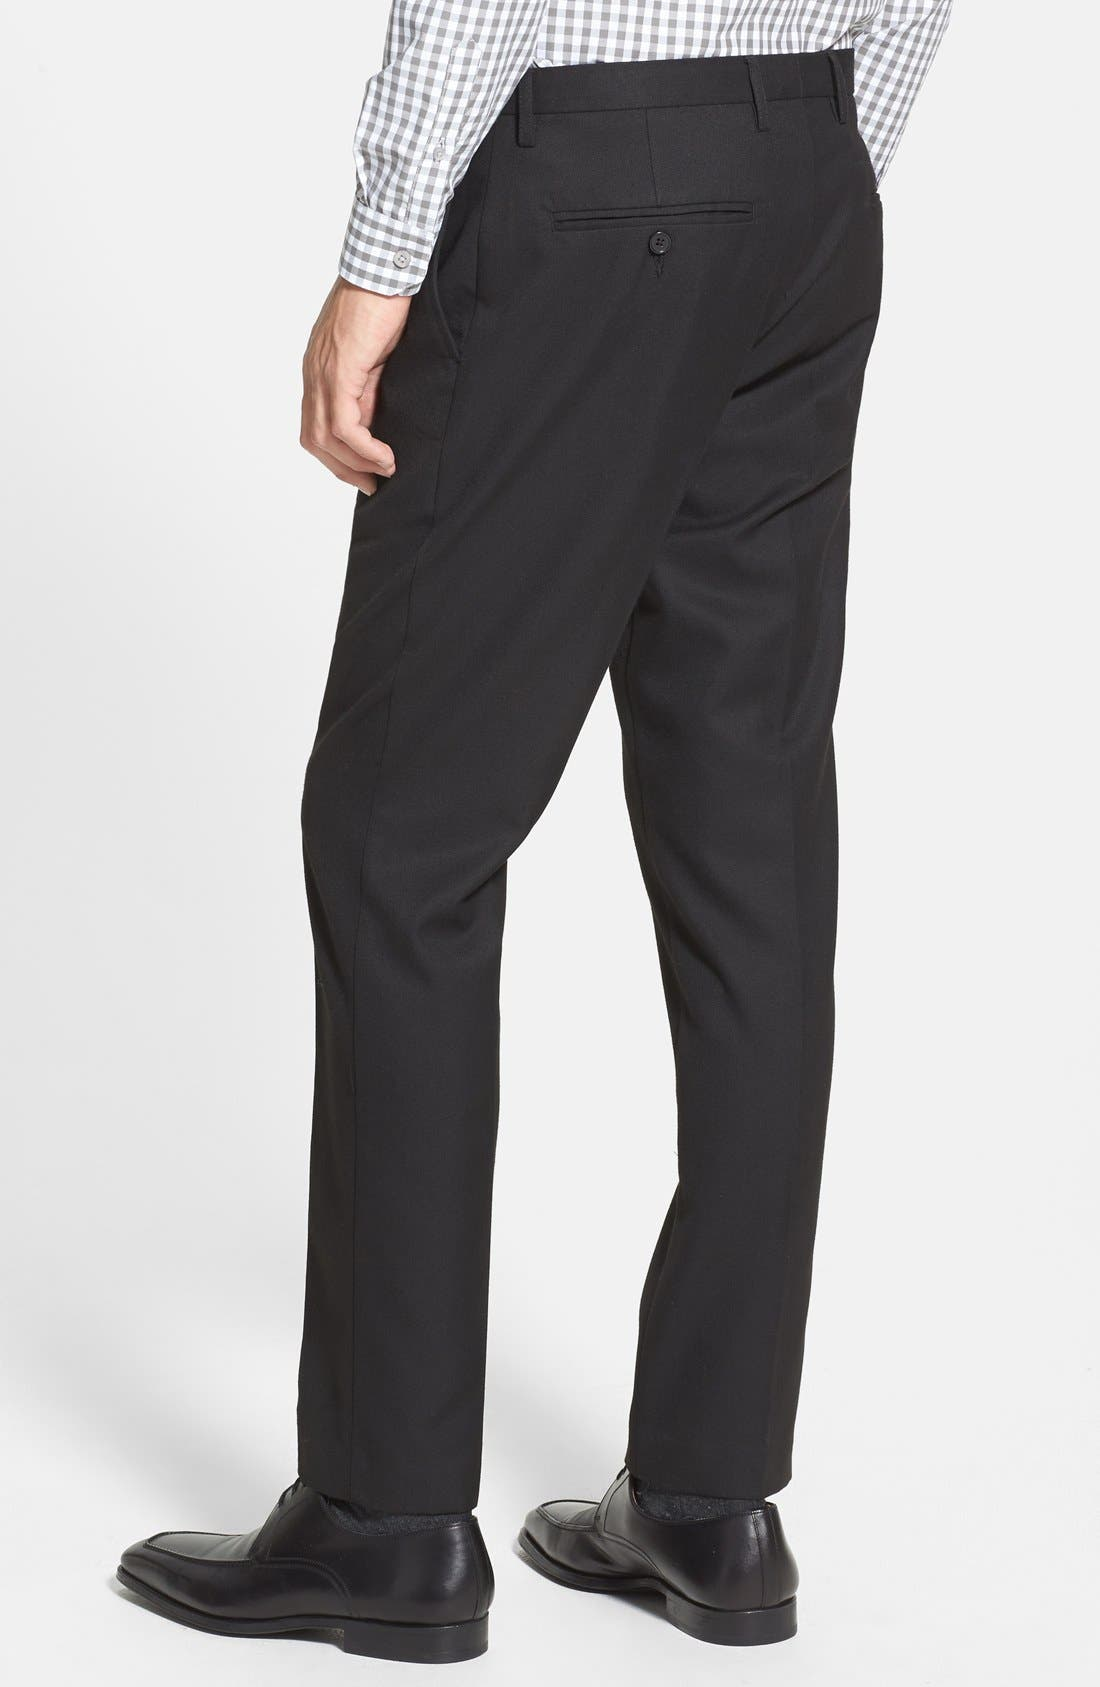 TOPMAN, Skinny Fit Cotton Flannel Trousers, Alternate thumbnail 3, color, 001